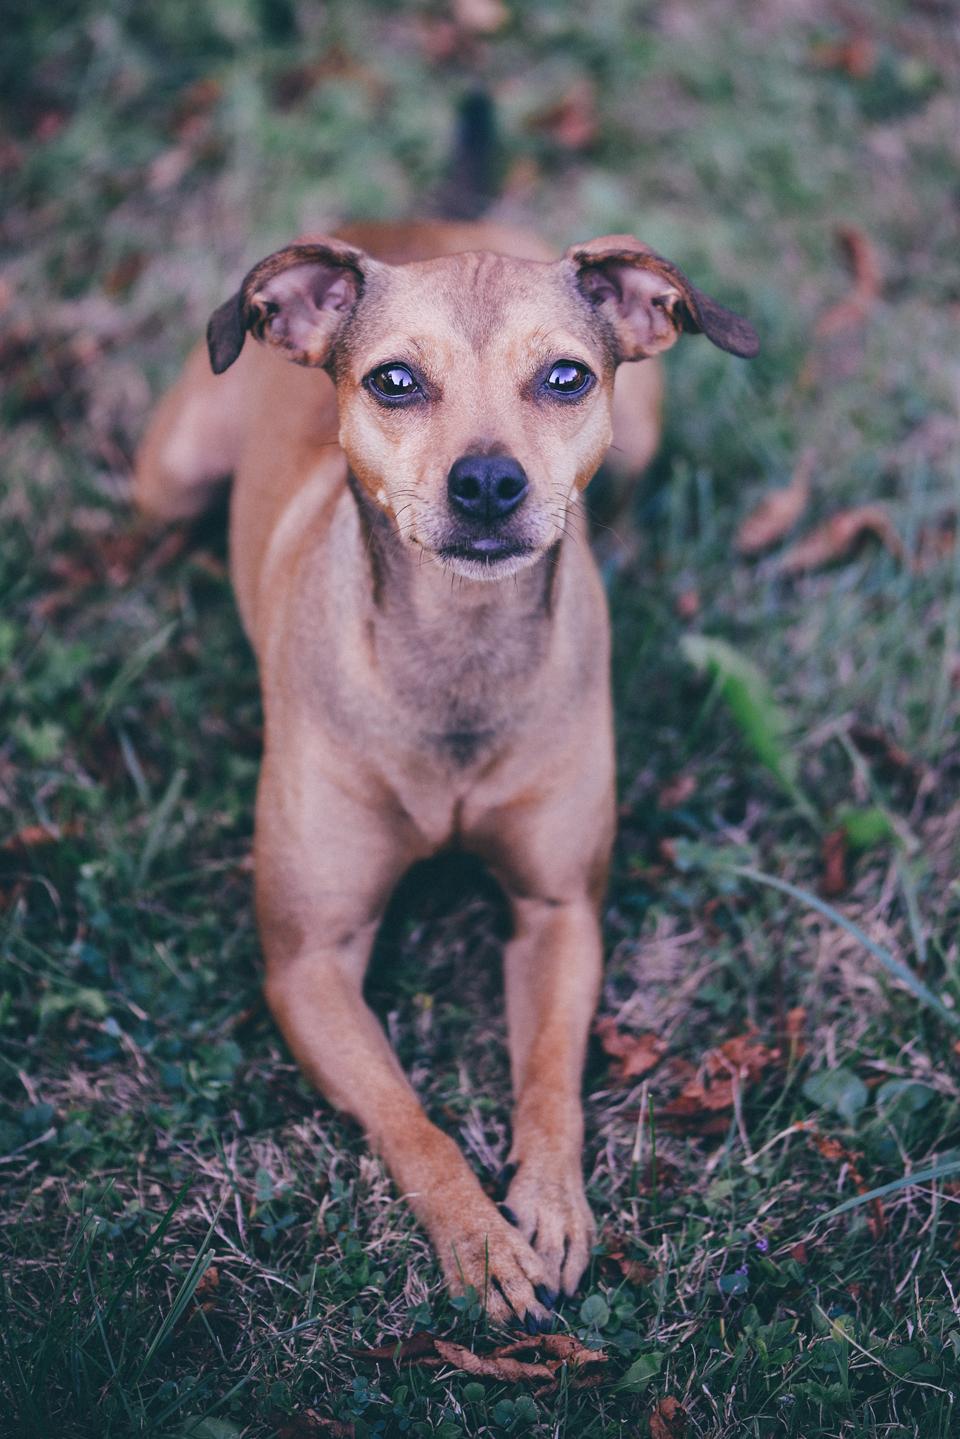 Fotografie Shooting Tiere Haustiere Hund Hunde Welpen 4-Beiner Karlsruhe Ettlingen Rastatt Bretten Bruchsal Pforzheim10 Kopie